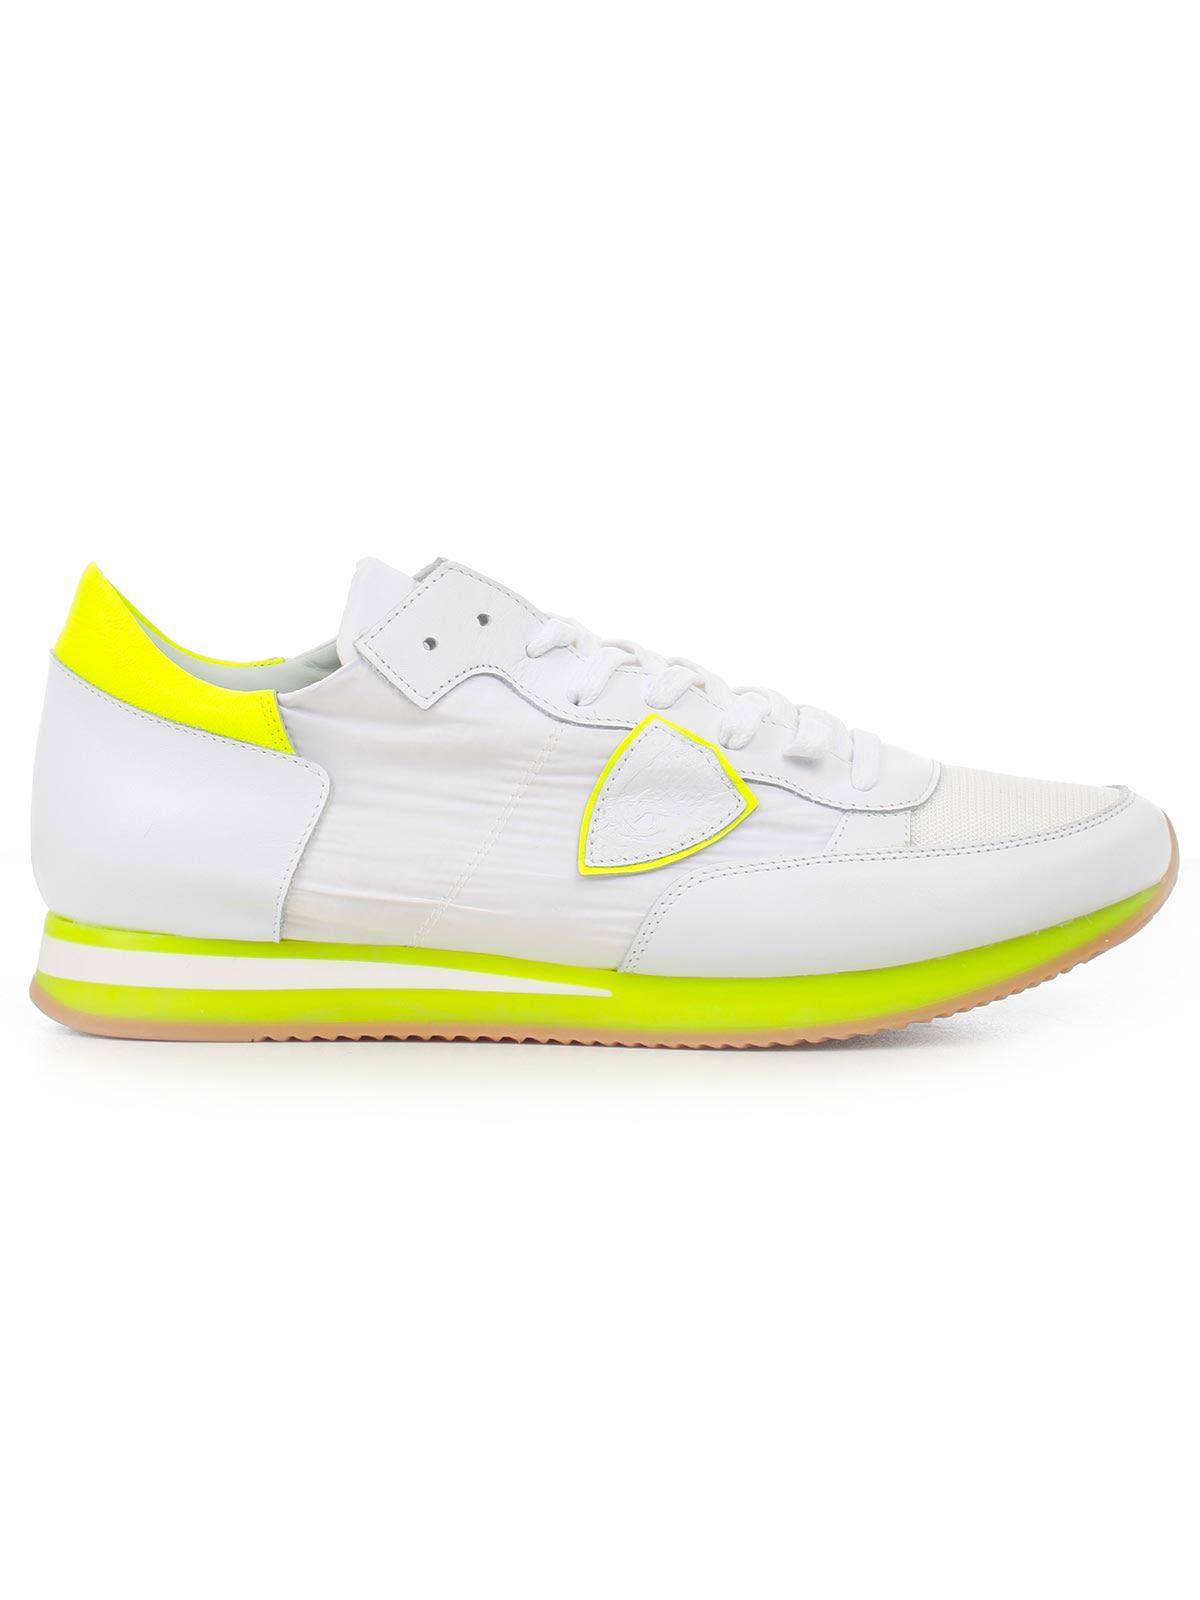 Philippe Model Scarpa Tropez - Mondial White Yellow ... be1ec988a82